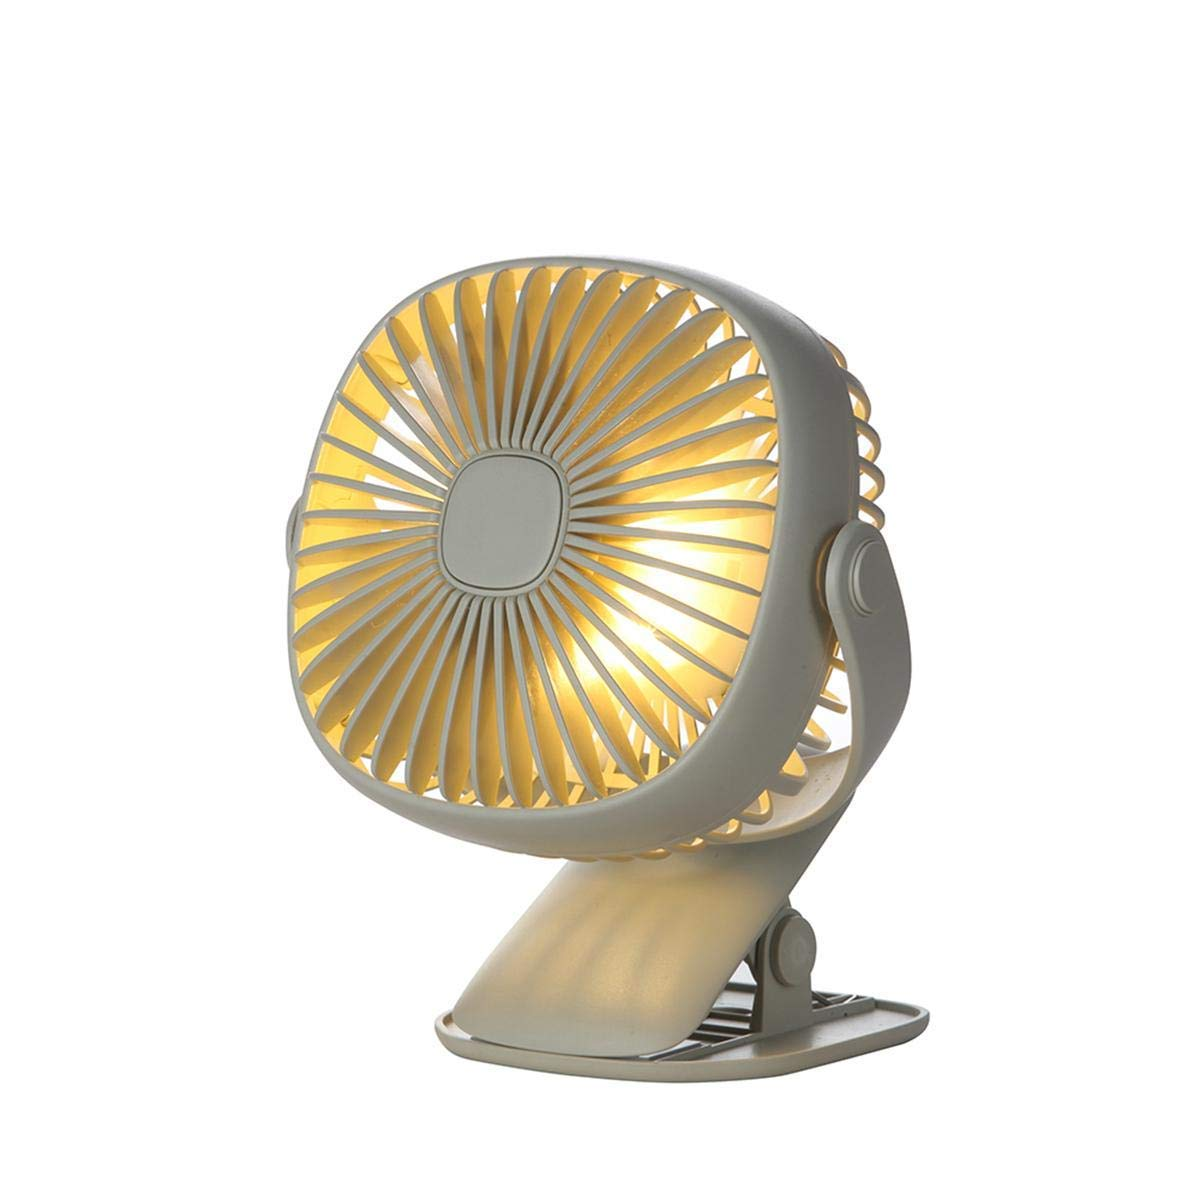 KOBWA Clip on Fan with LED Night Light Electronics Square Box Night Light Mini Fan,720 Degree Fan Portable USB Rechargeable Student Dormitory Office Shake Fan Desktop Family Travel Fan (White)